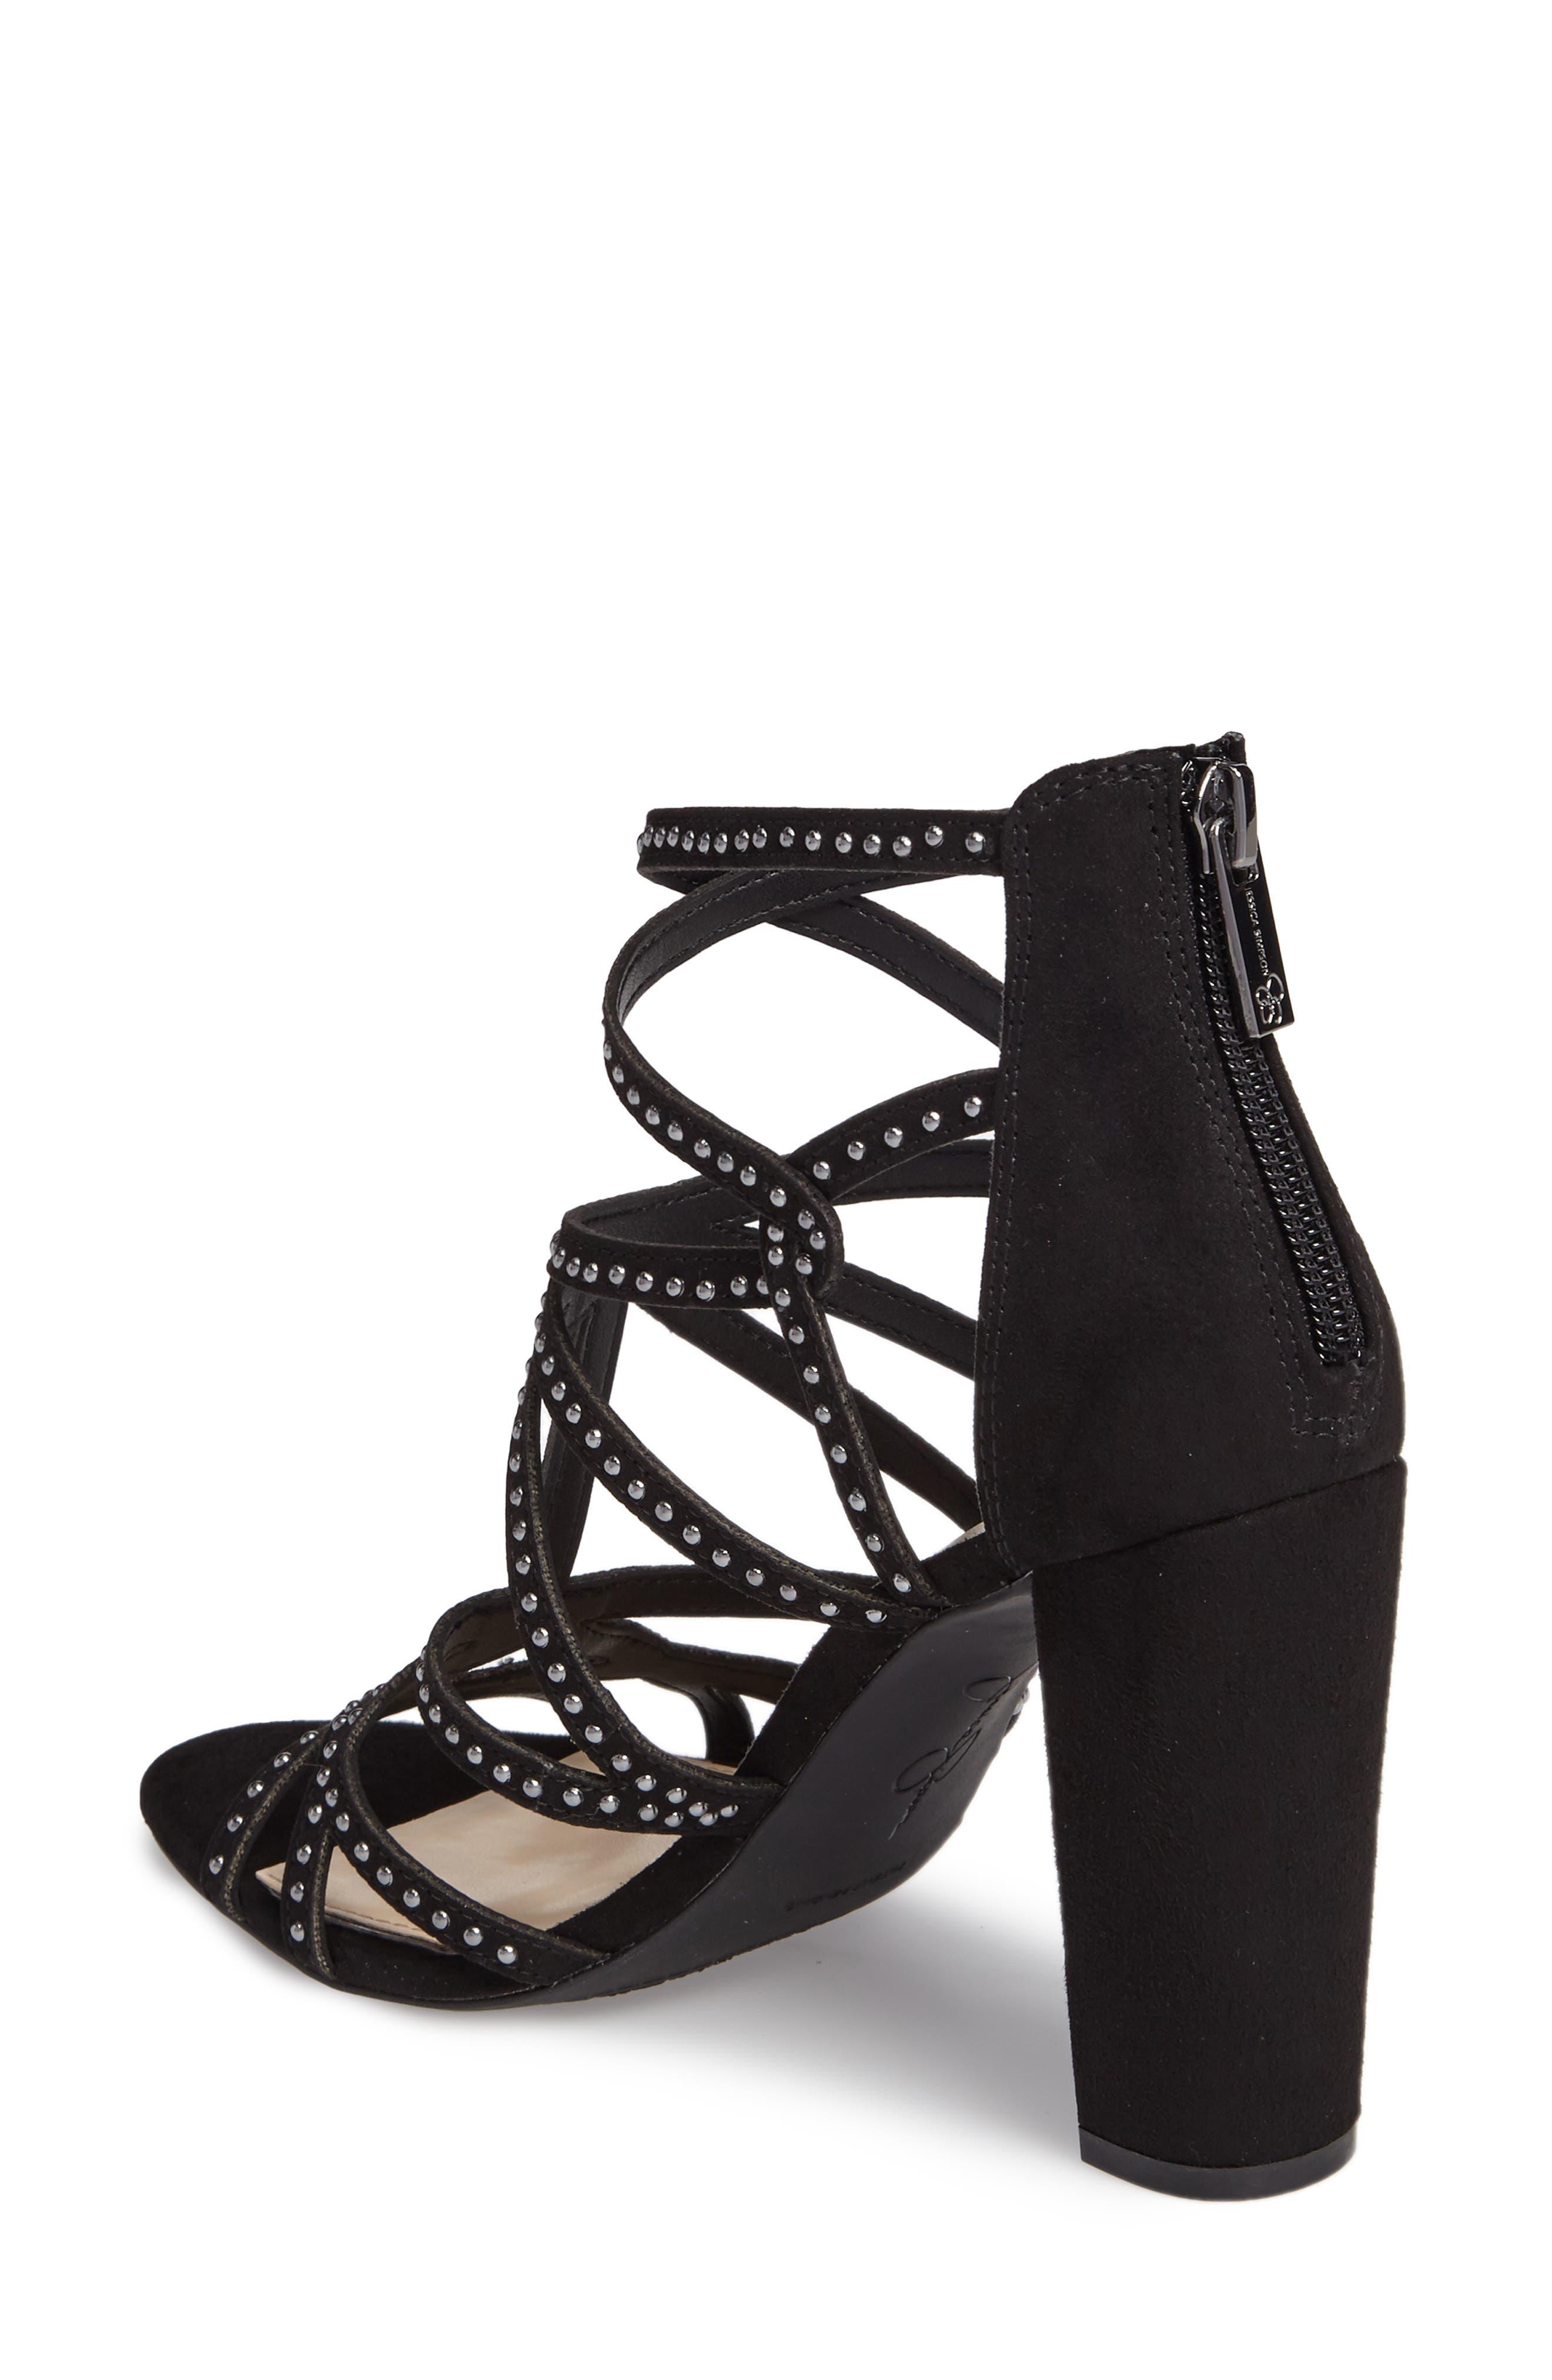 Emmi Block Heel Sandal,                             Alternate thumbnail 2, color,